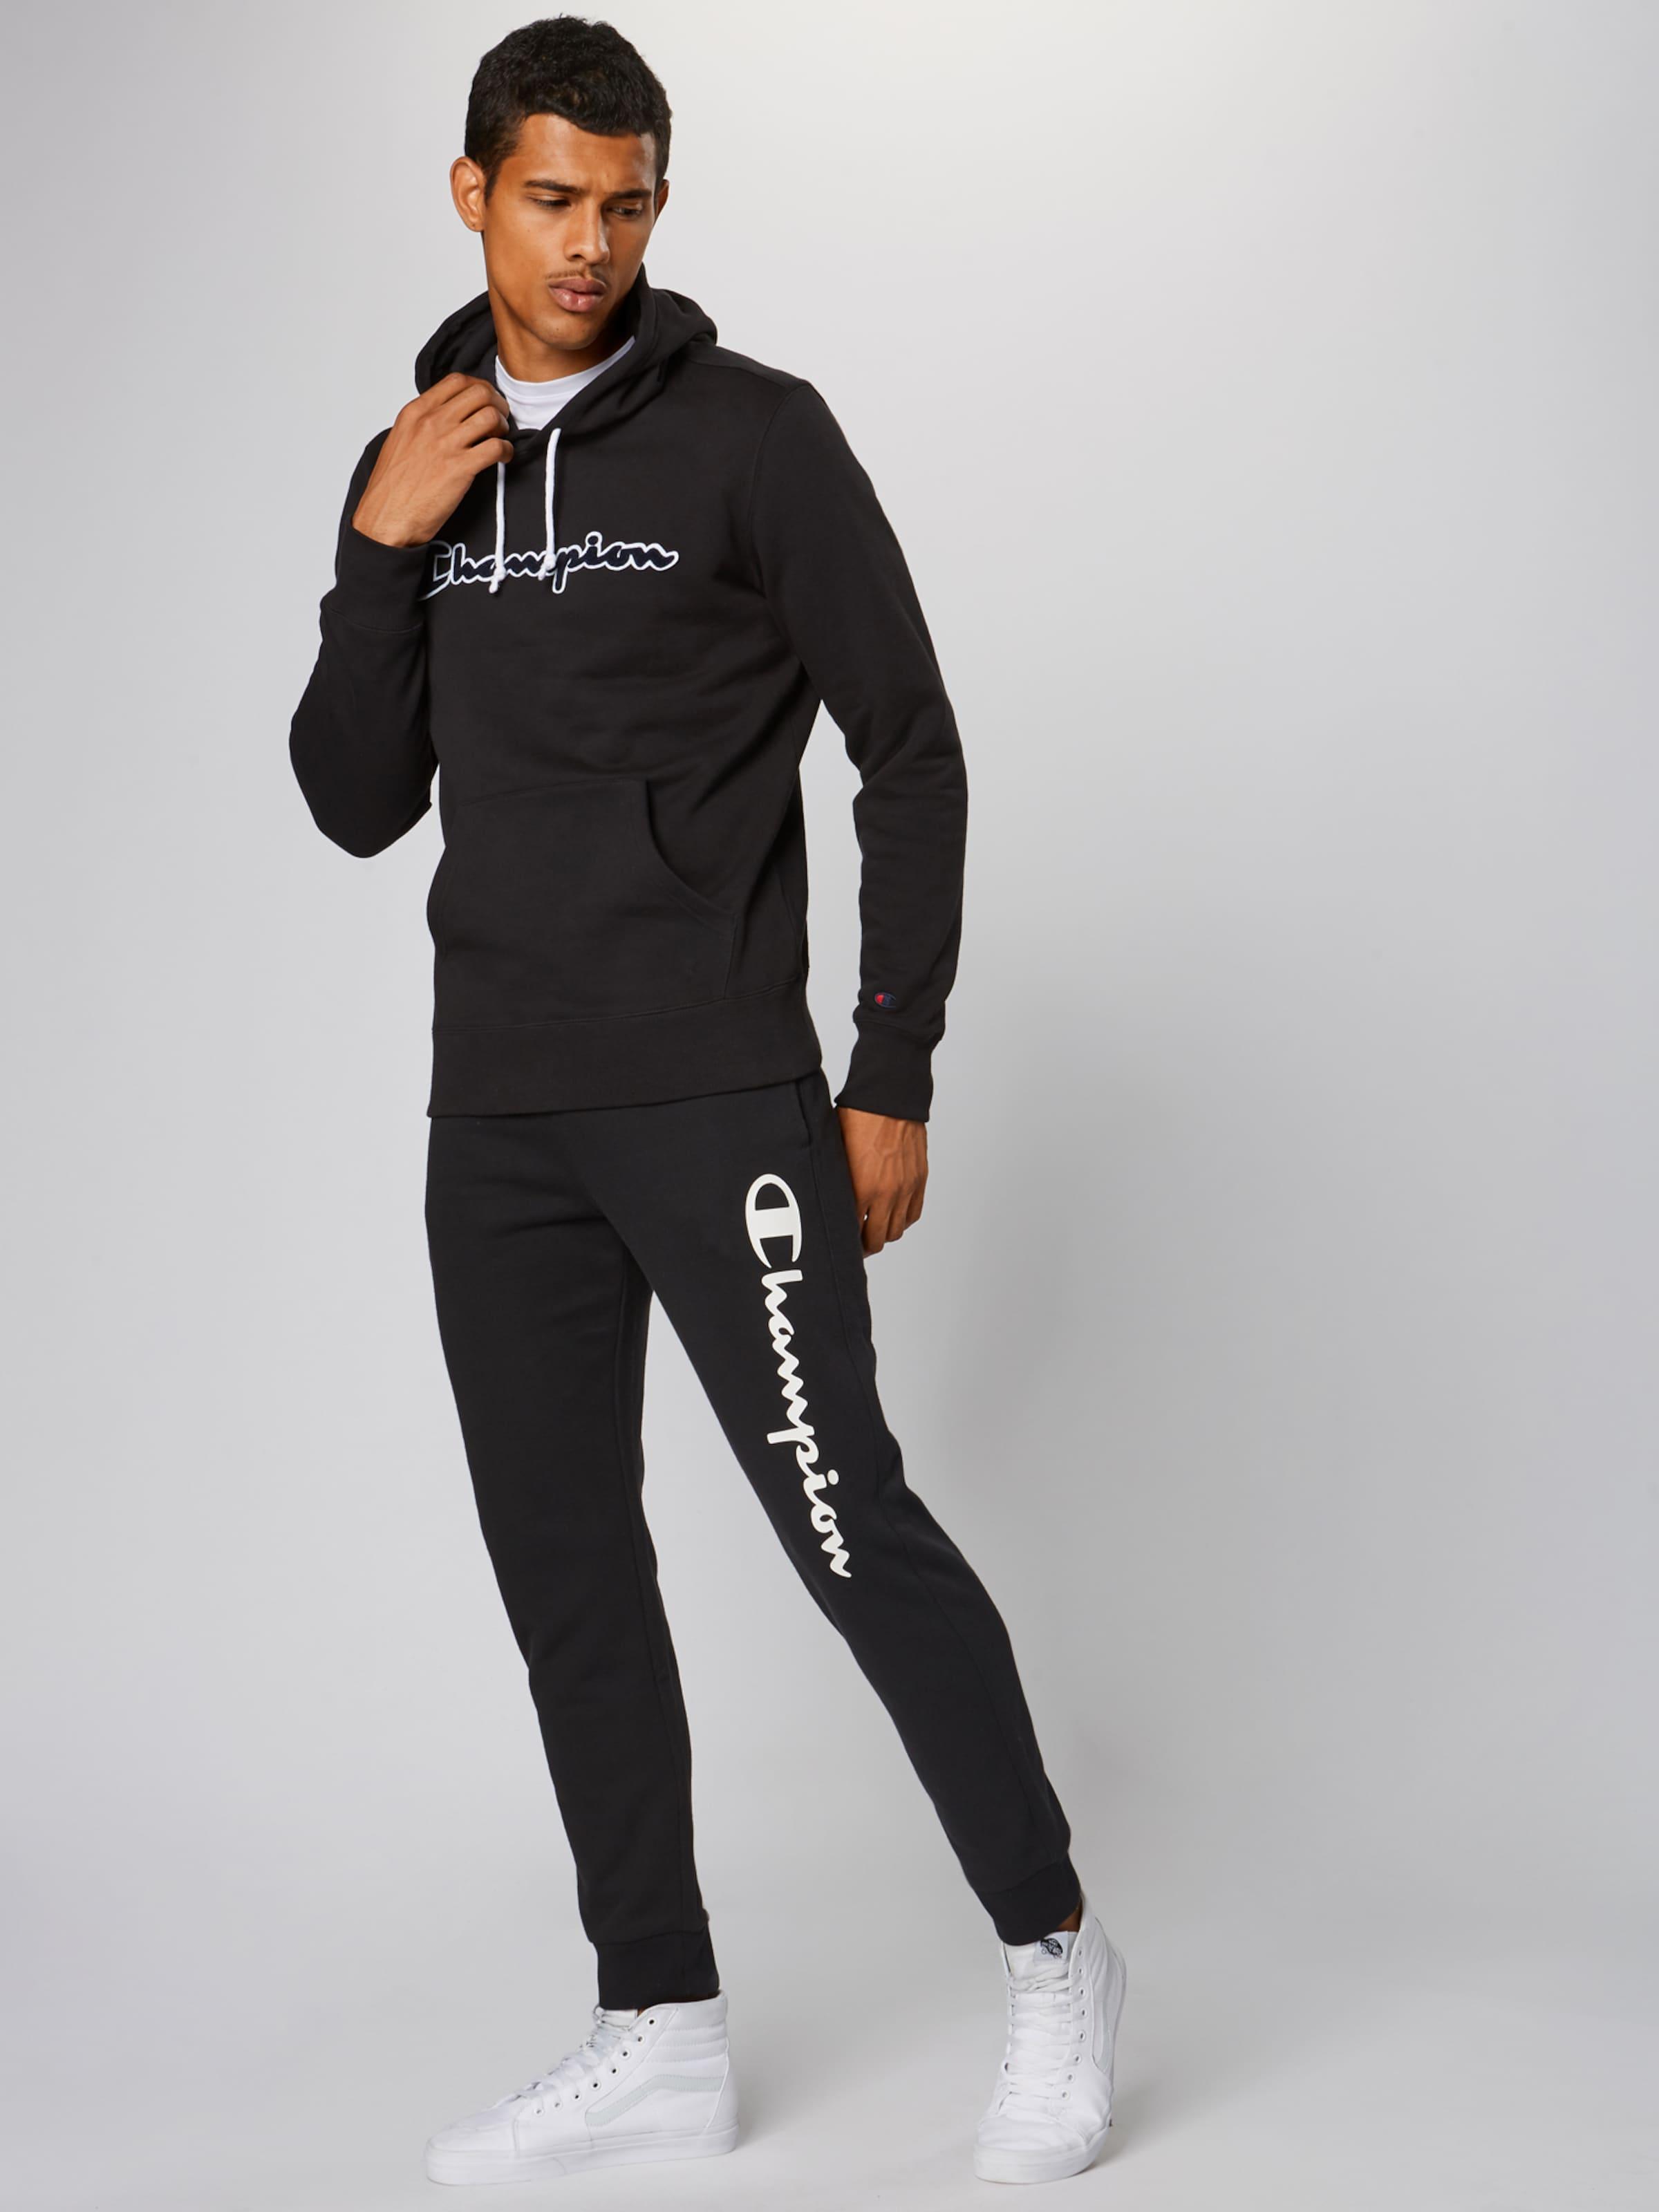 Athletic Cuff En Apparel Noir Authentic 'rib Champion Pantalon Pants' D92WIeEHY